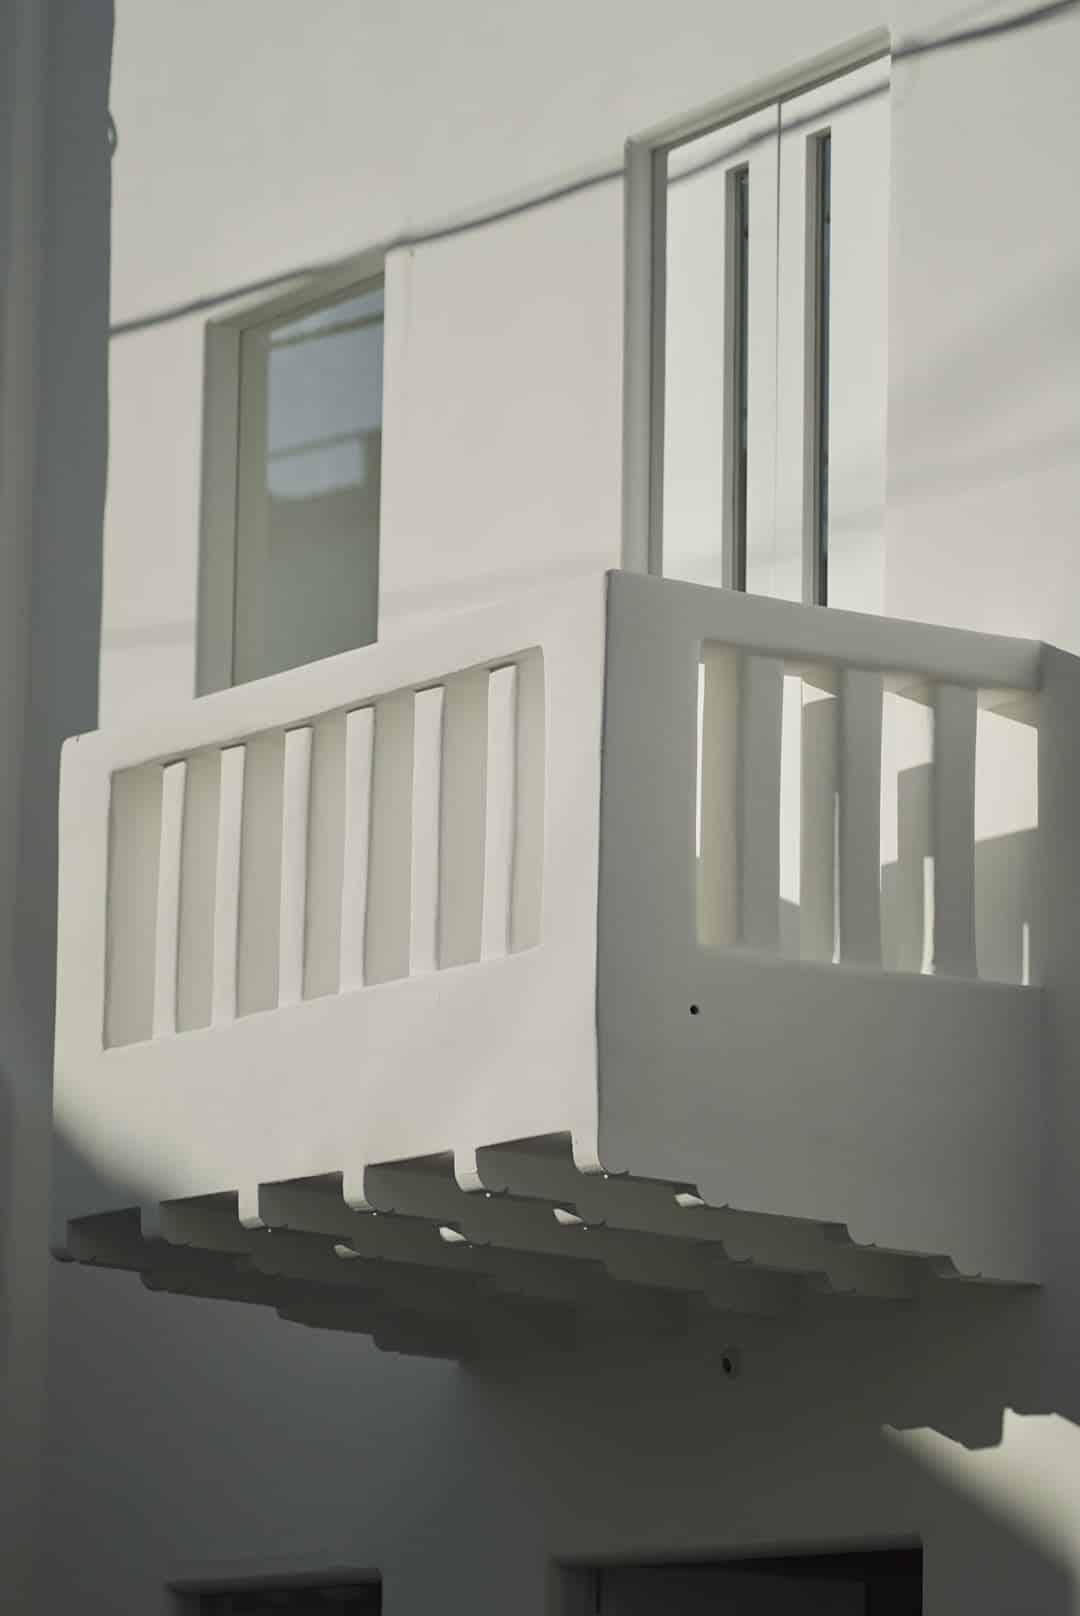 Beautiful shadows on buildings